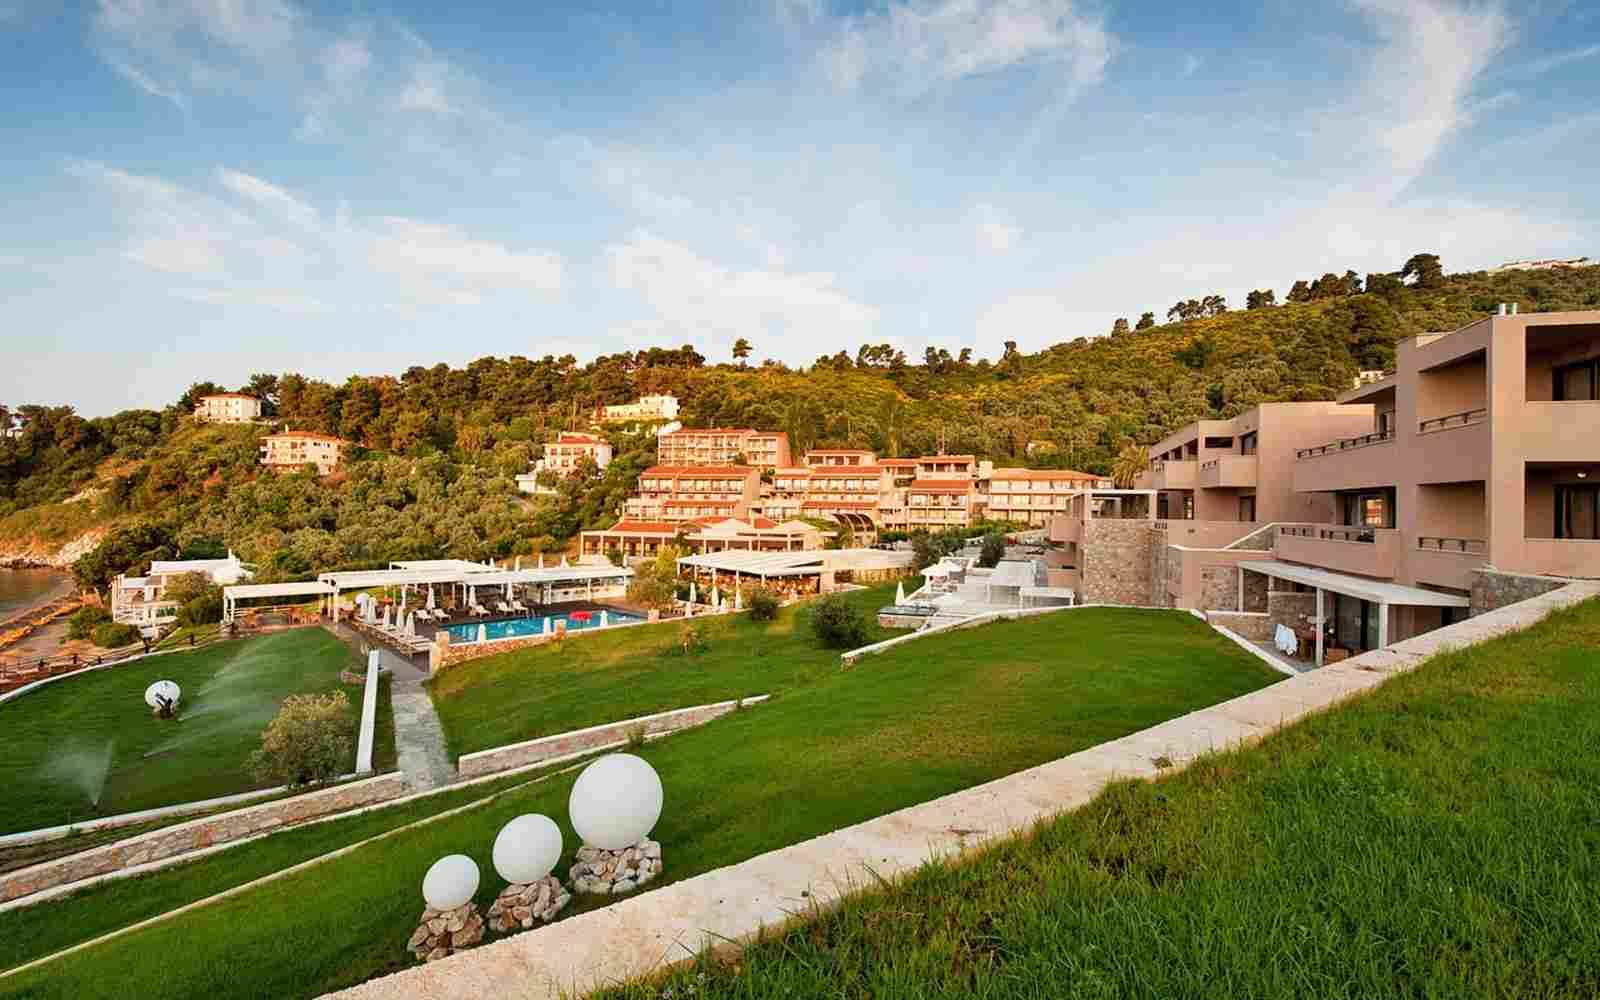 http://www.casacaribepuertomorelos.com/wp-content/uploads/2016/03/summer-hotel-02.jpg